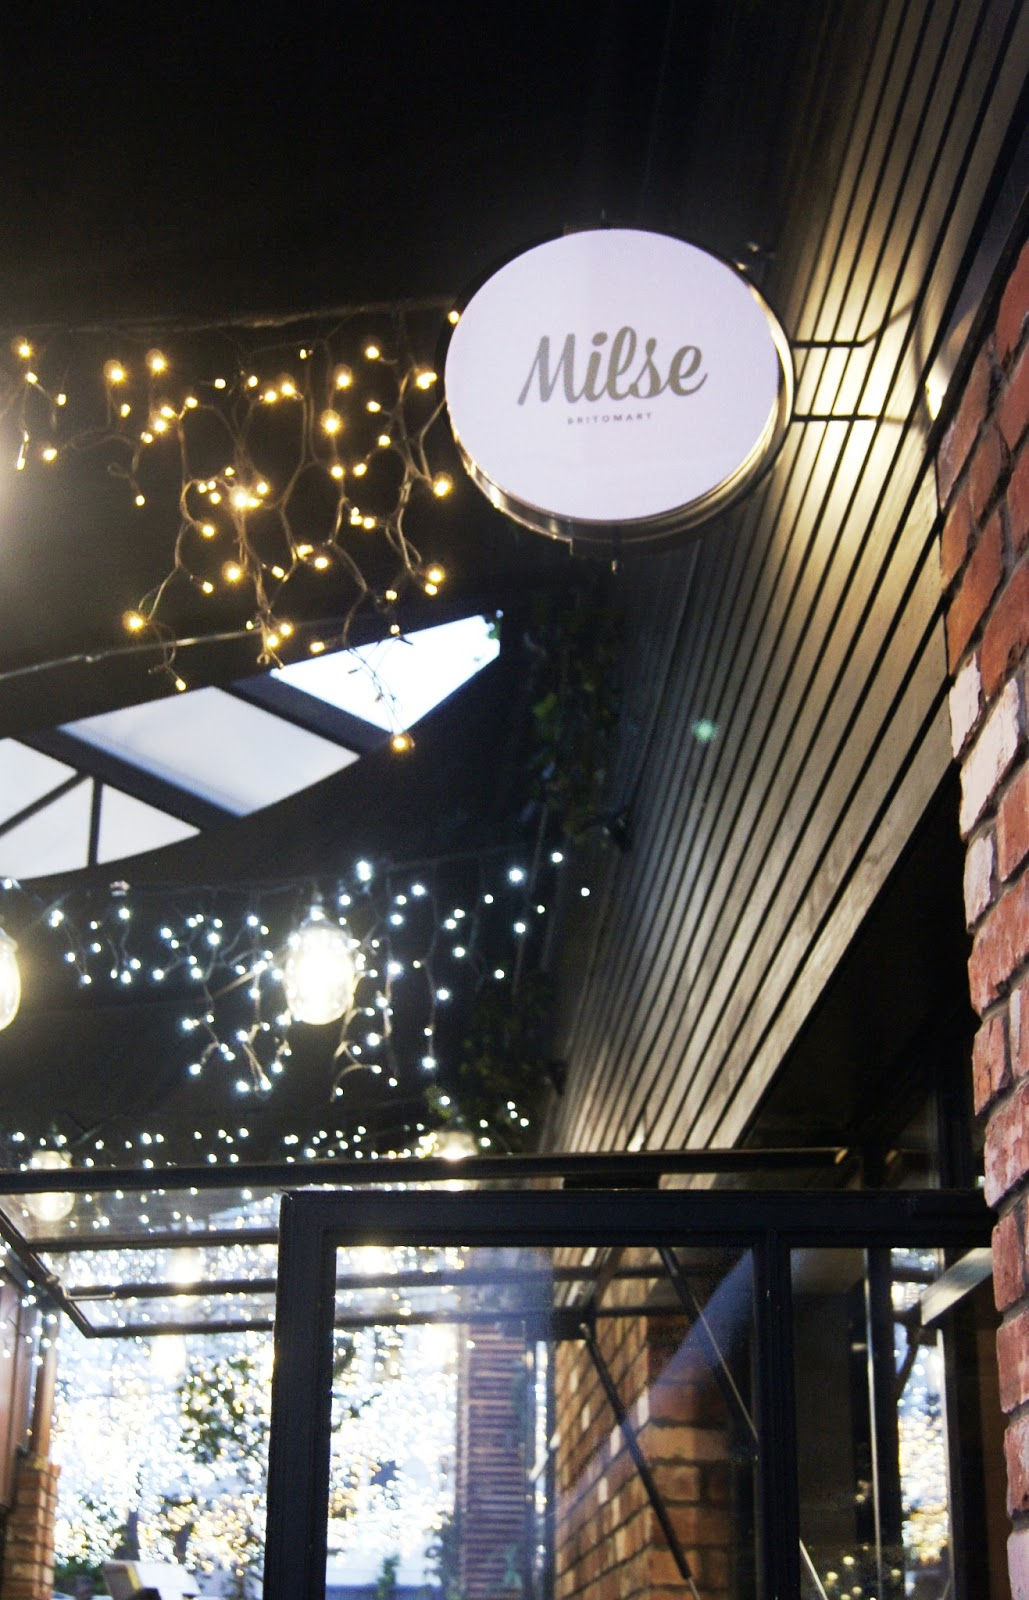 Milse restaurant Auckland, top auckland restaurant, dessert auckland